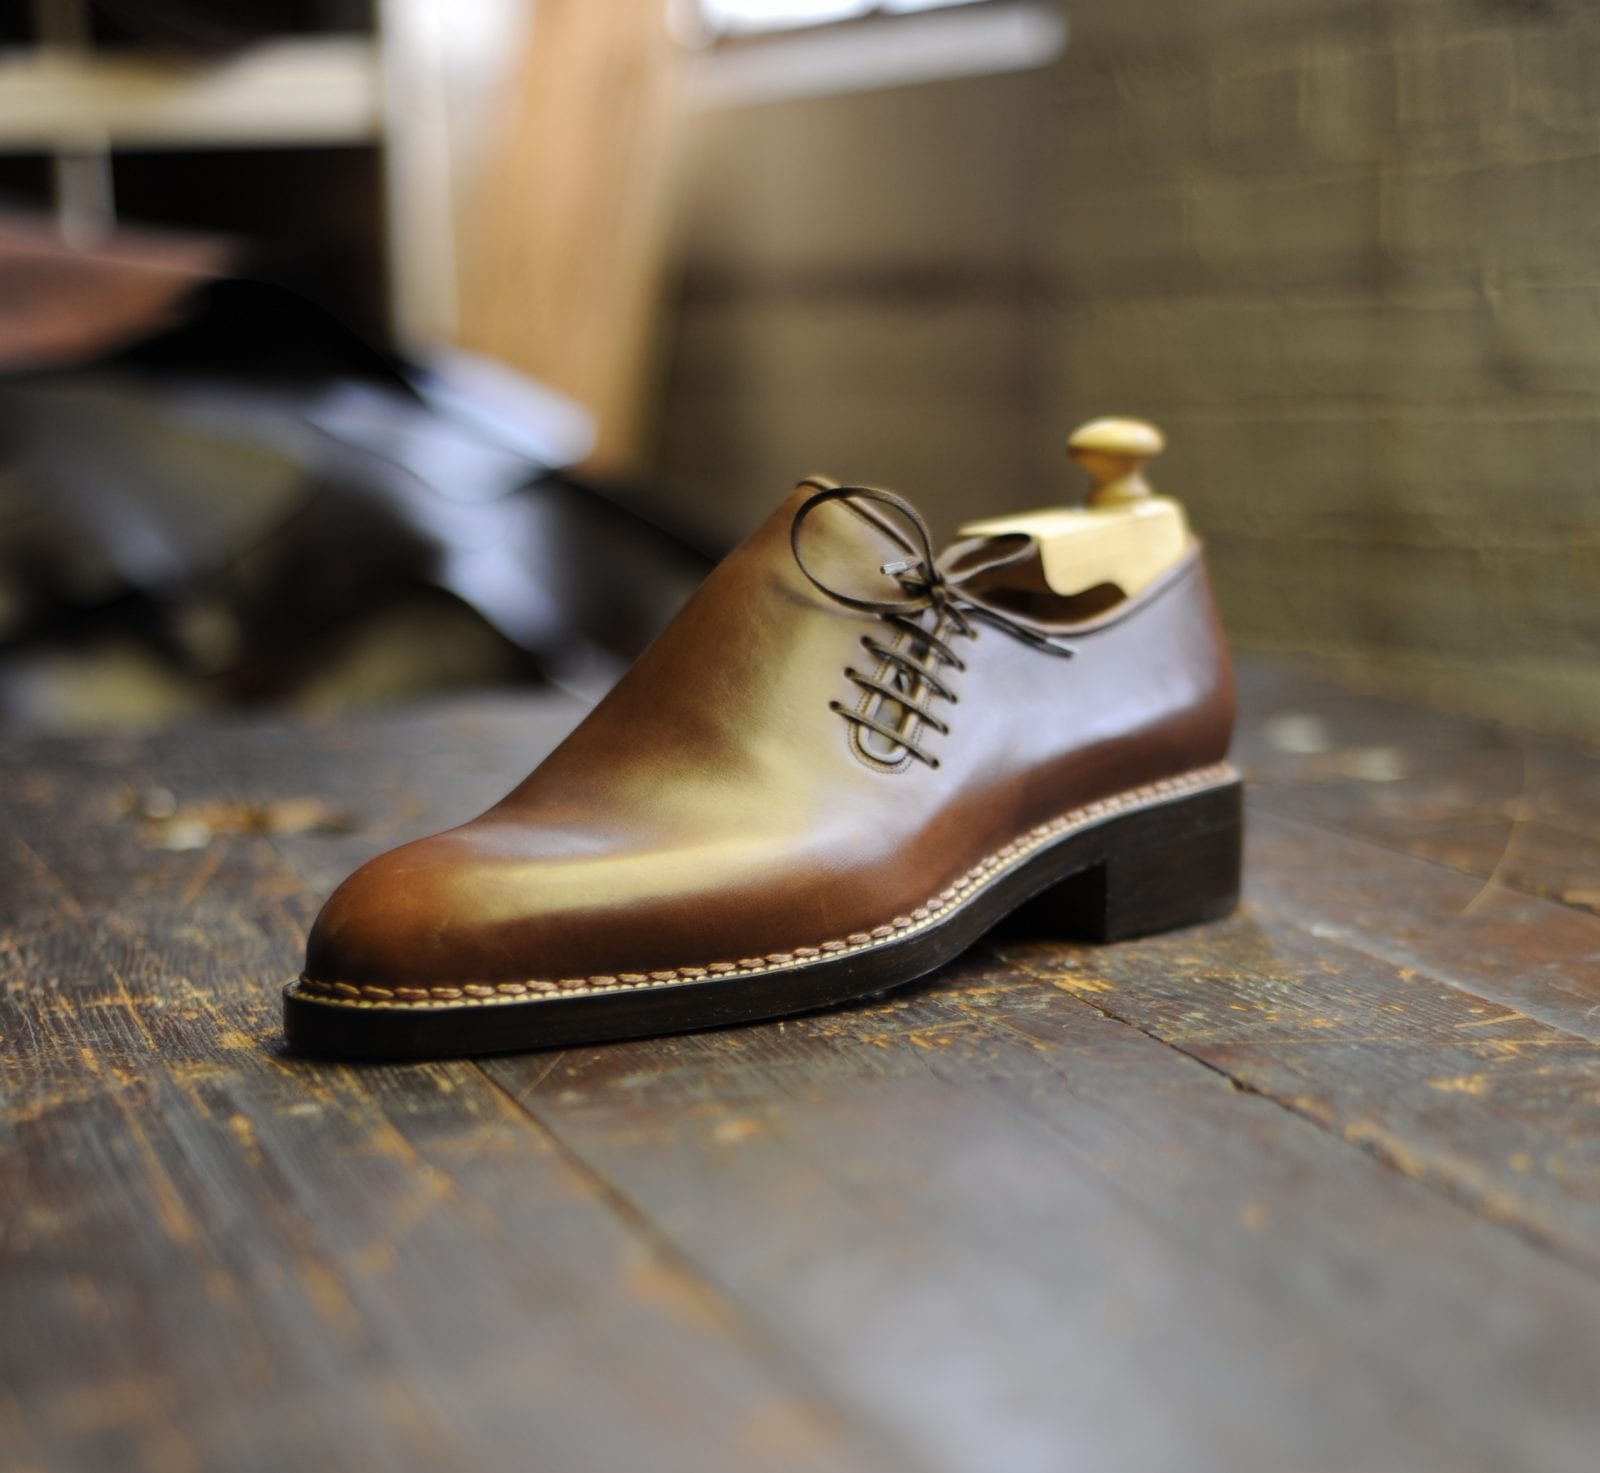 nah 0102 - Stefano Bemer – Arta pantofilor bespoke la Florența